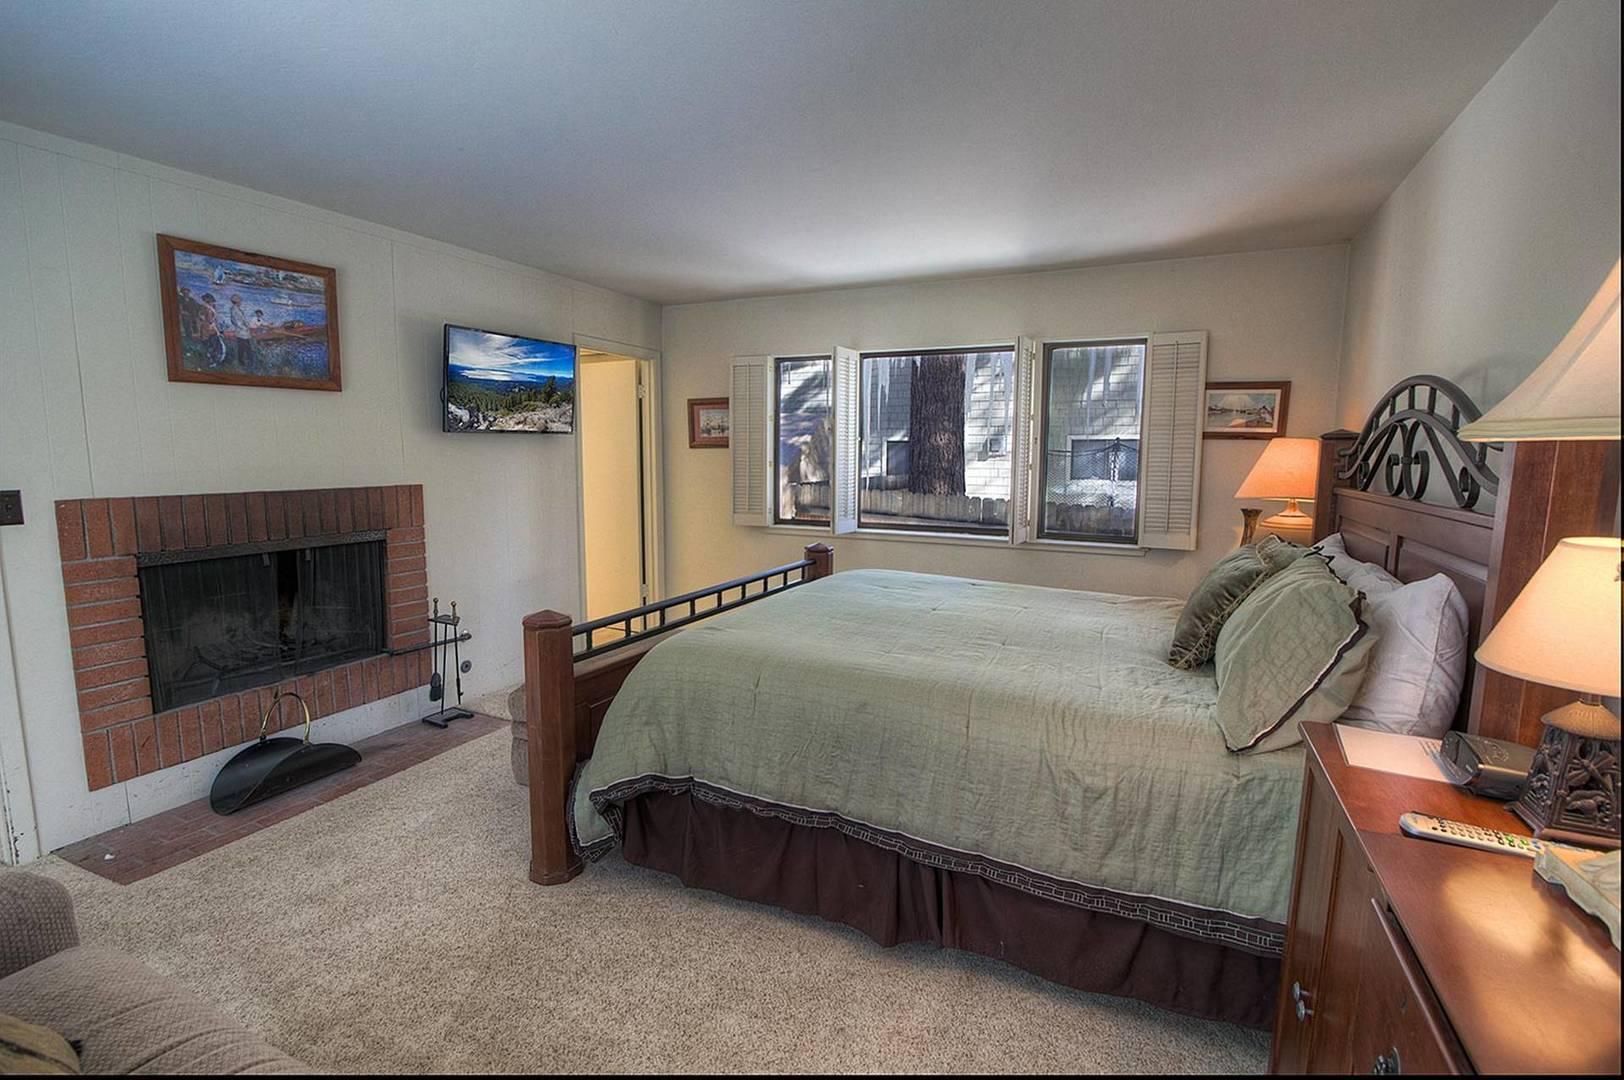 ivh0669 bedroom